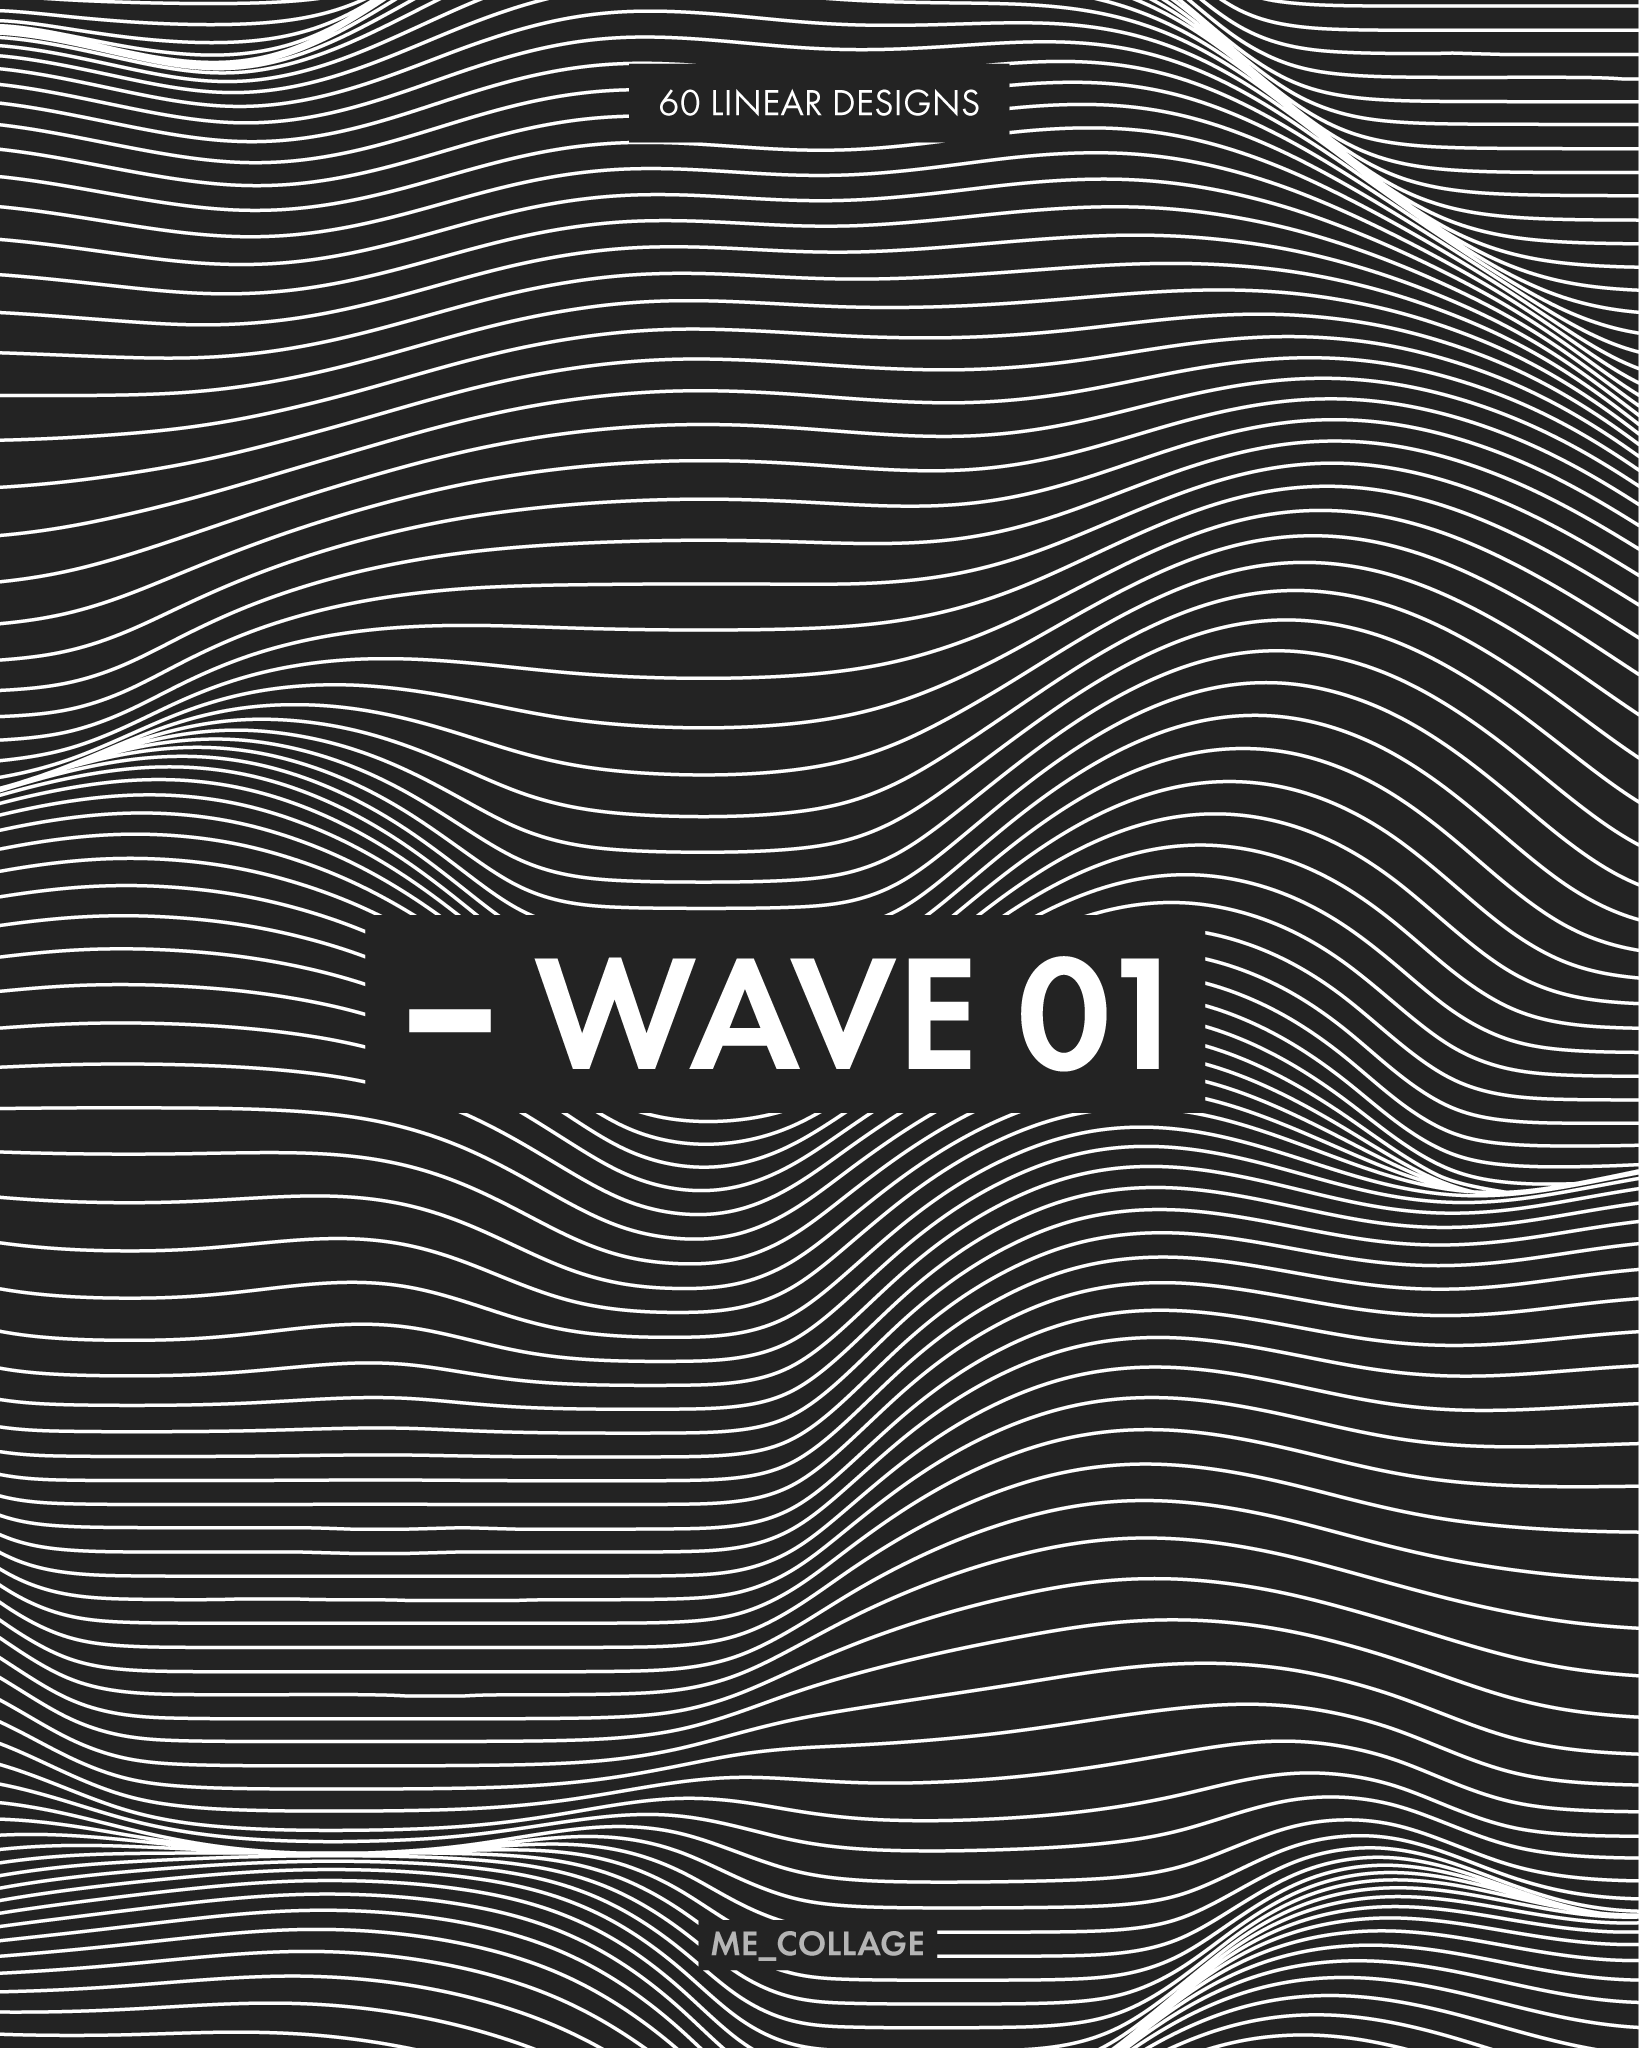 Wave 01 60 Linear Vector Designs Vector Design Geometric Graphic Design Design